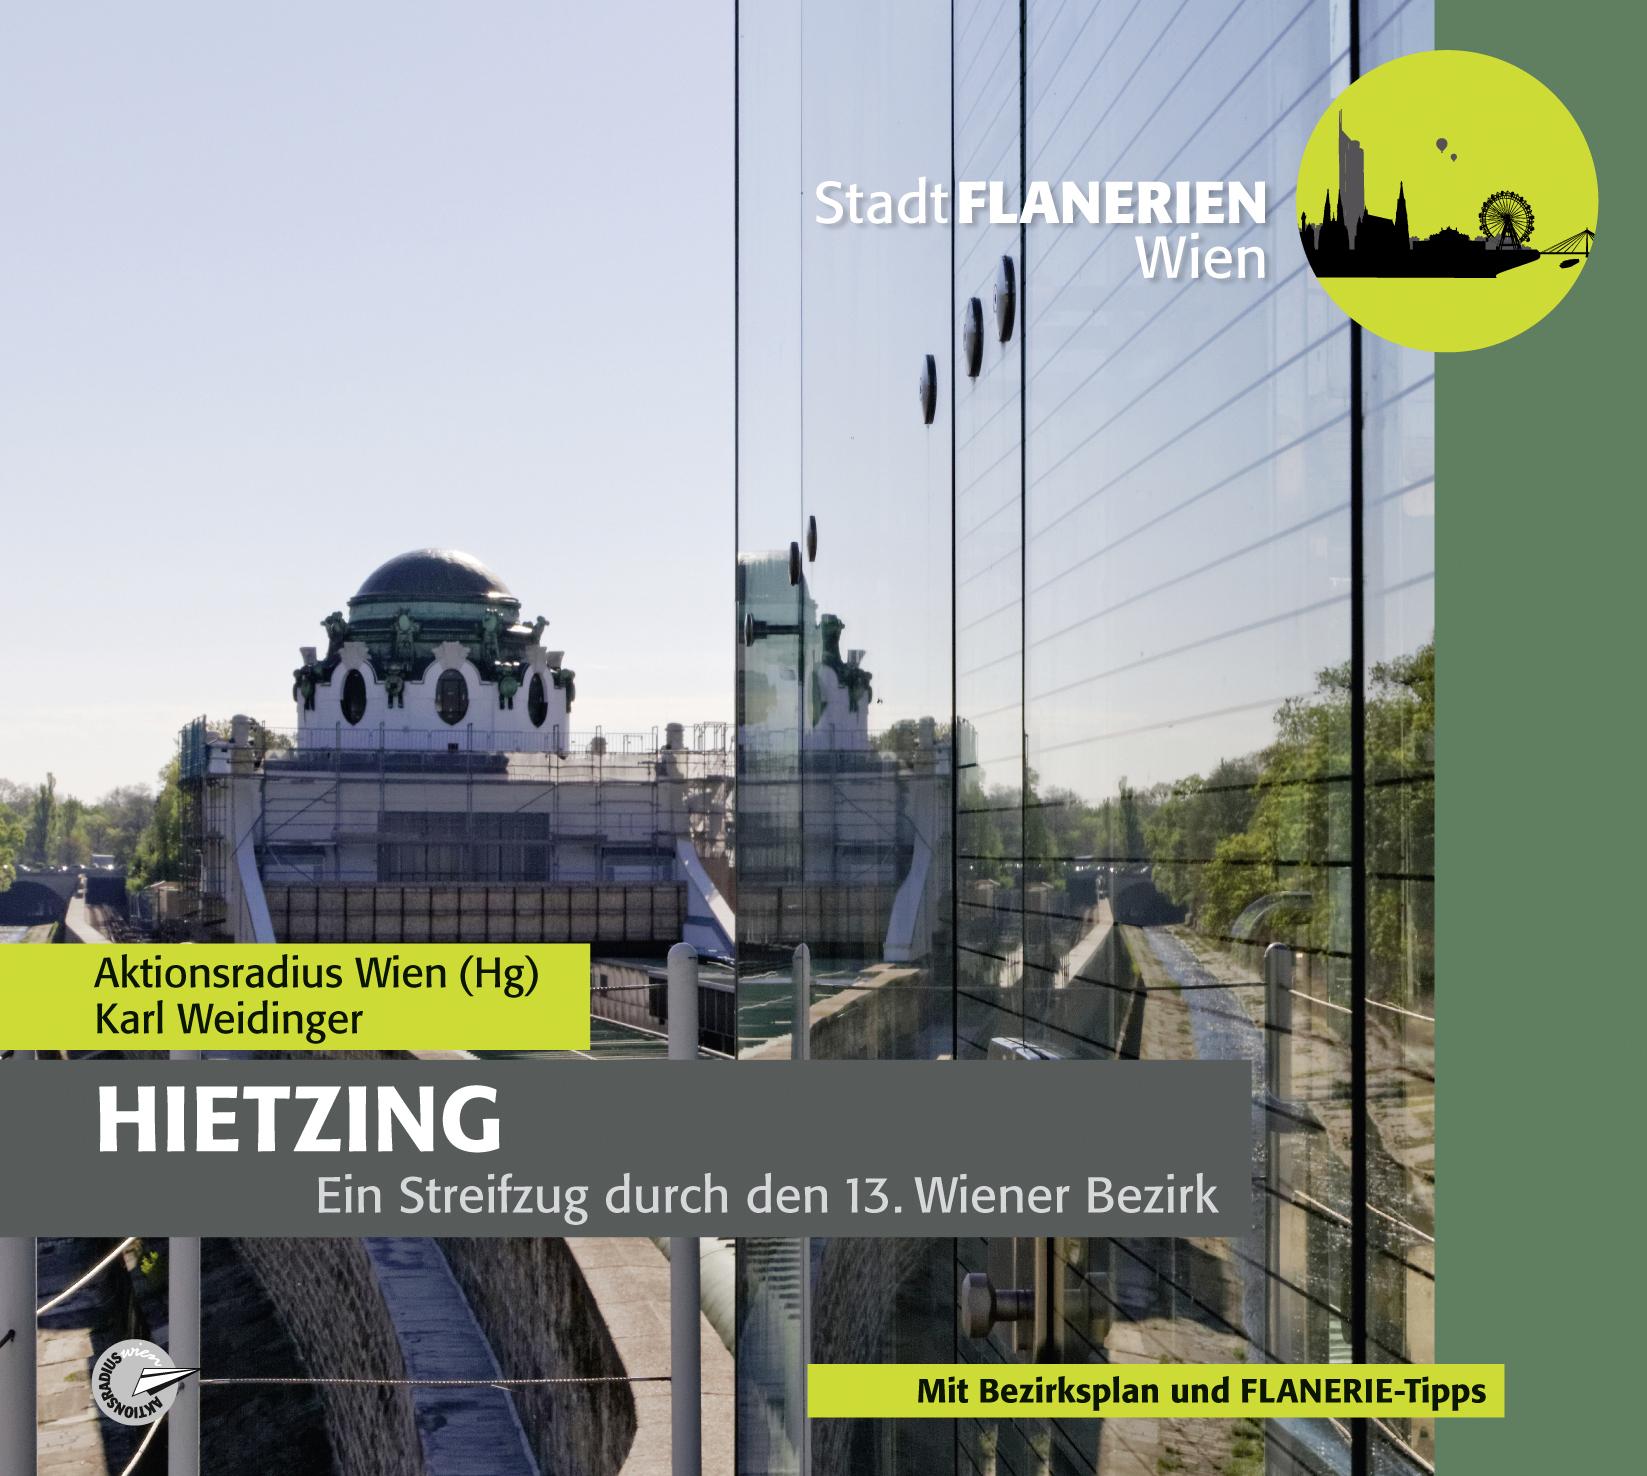 HÖRBUCH-PRÄSENTATION STADTFLANERIE HIETZING – Dienstag, 6. November